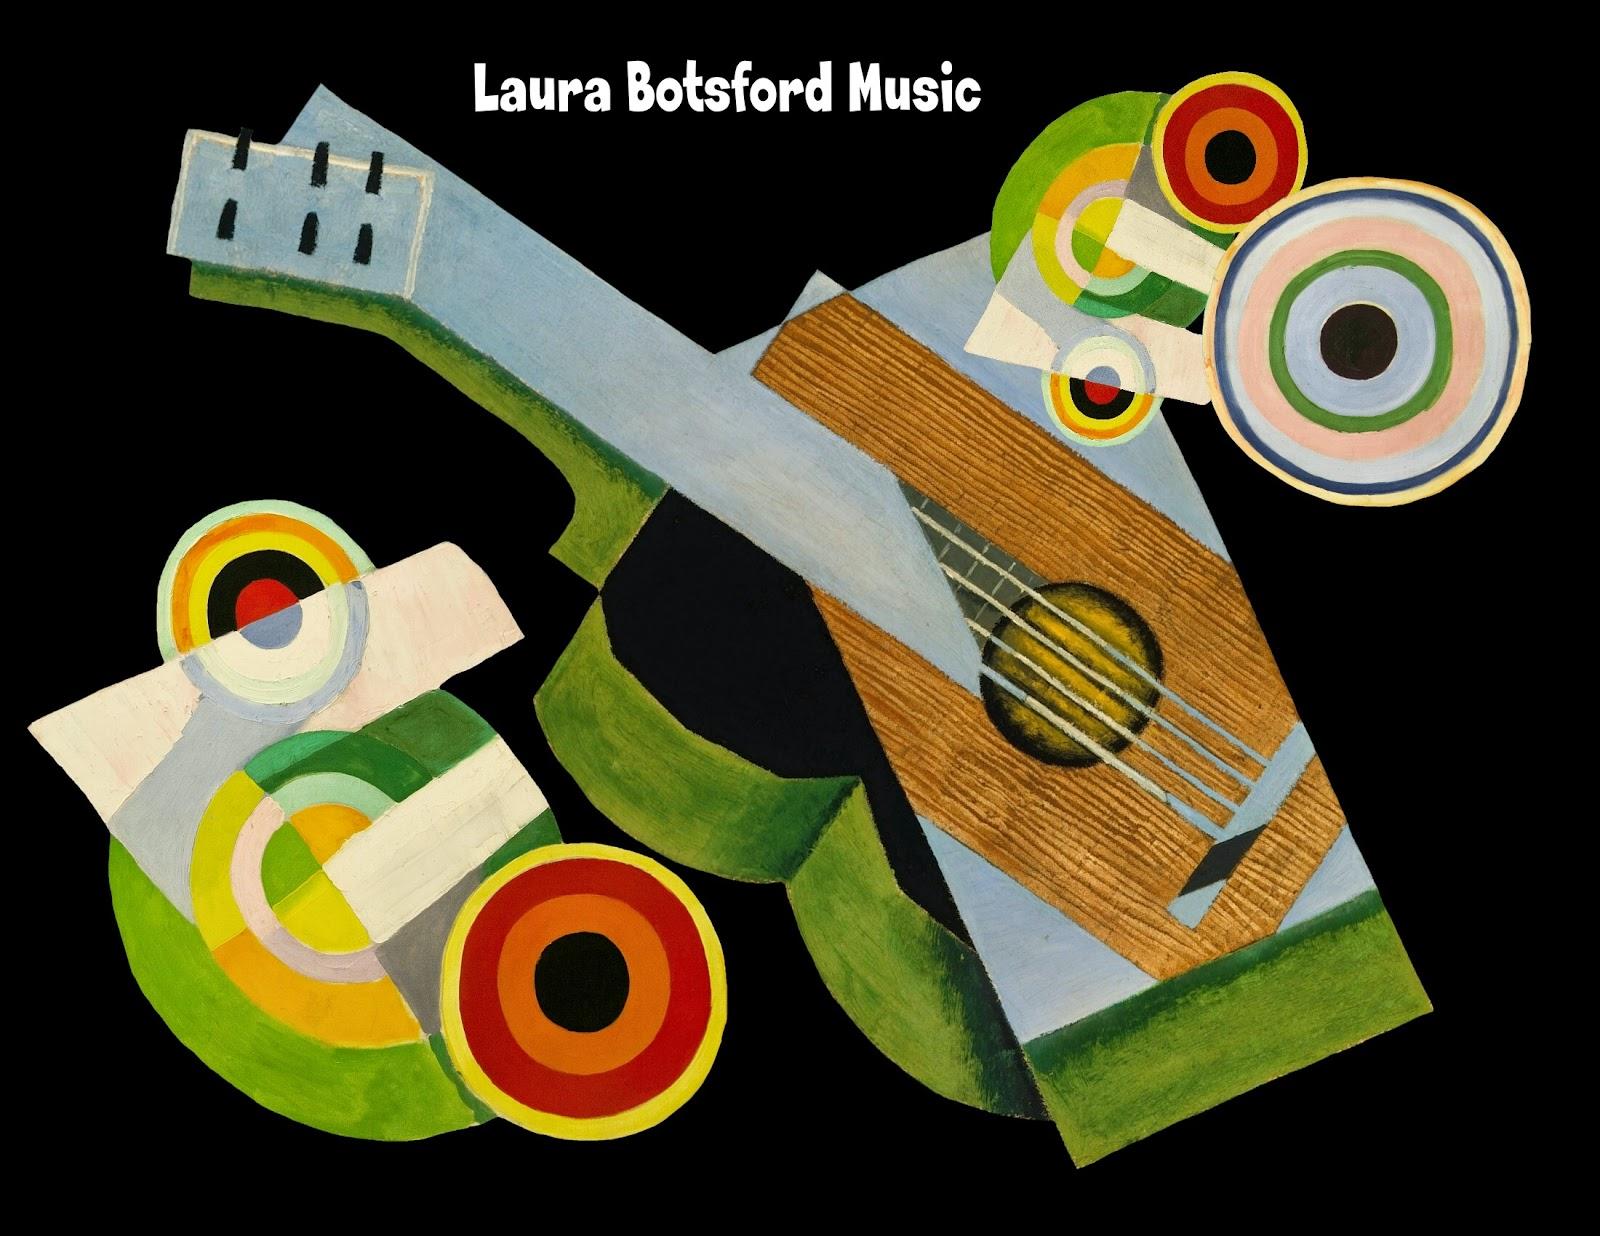 http://www.laurabotsfordmusic.com/